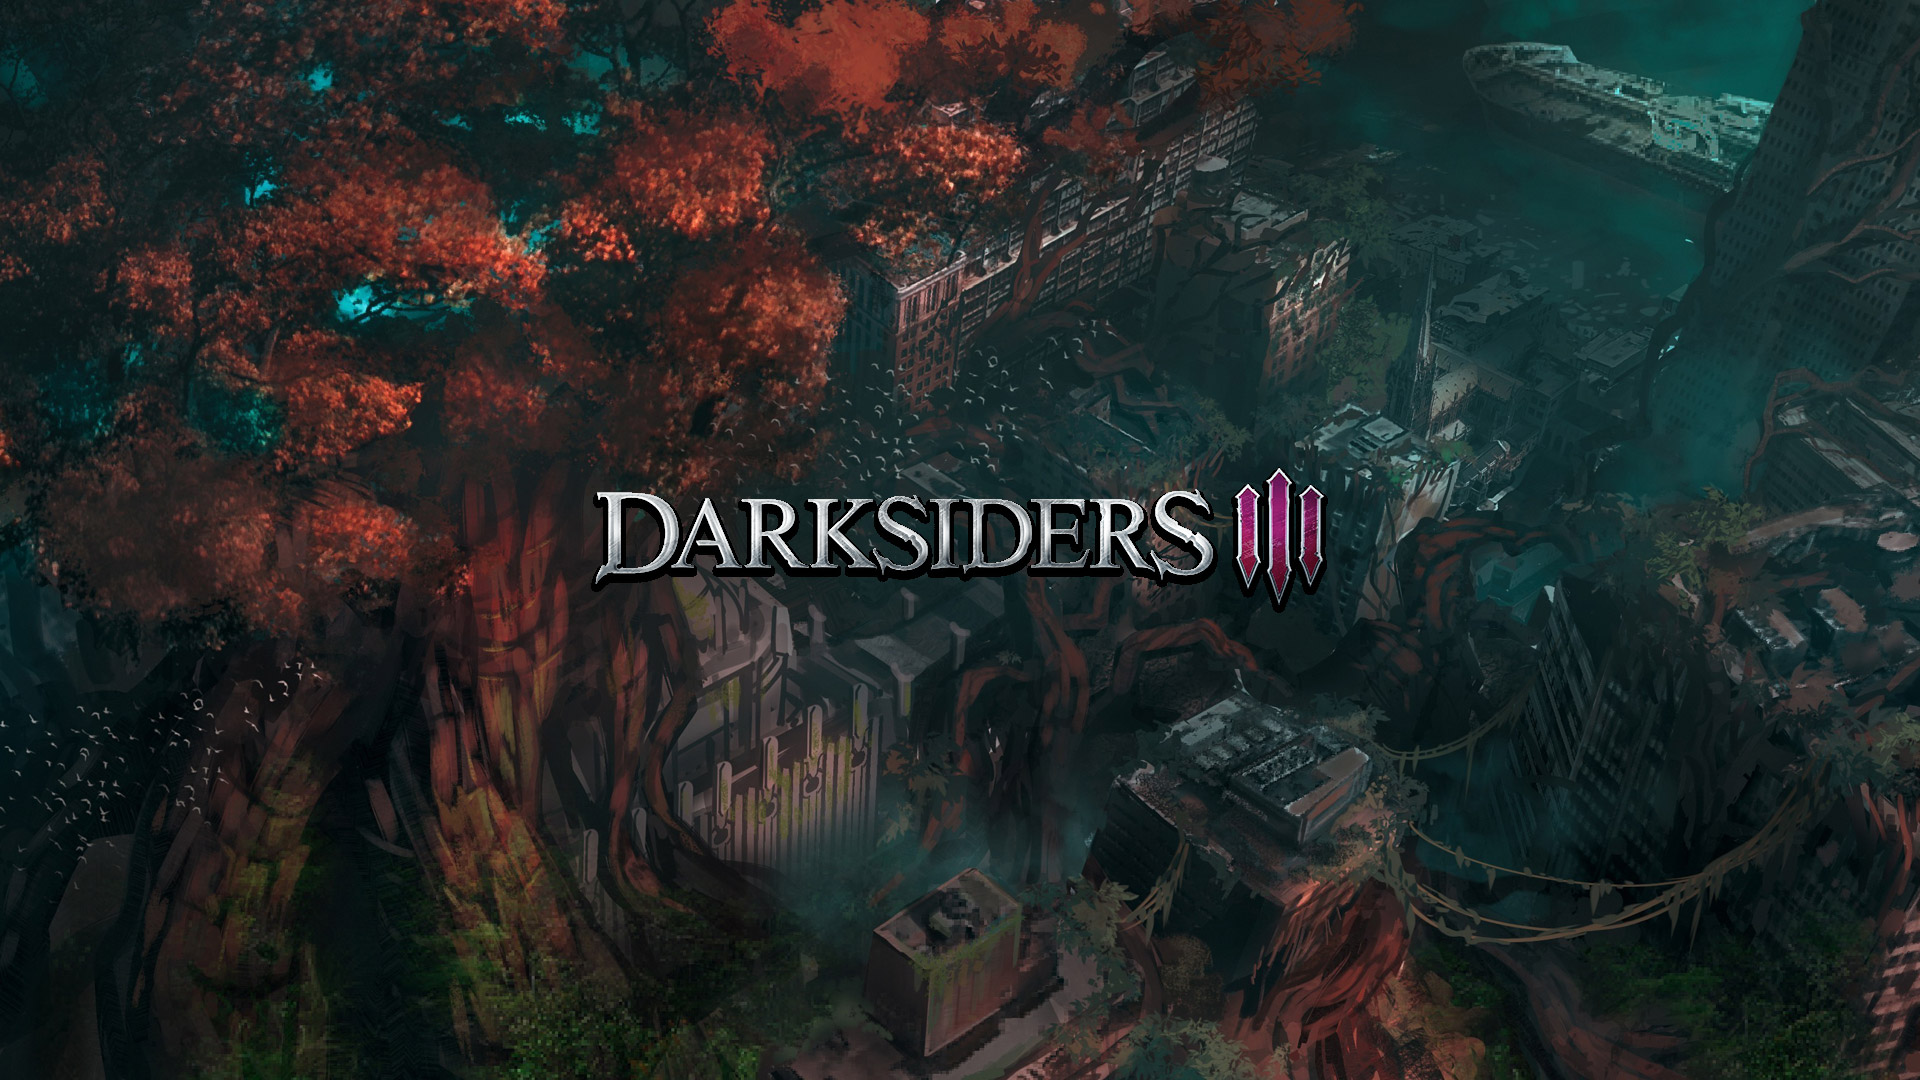 Free Darksiders III Wallpaper in 1920x1080